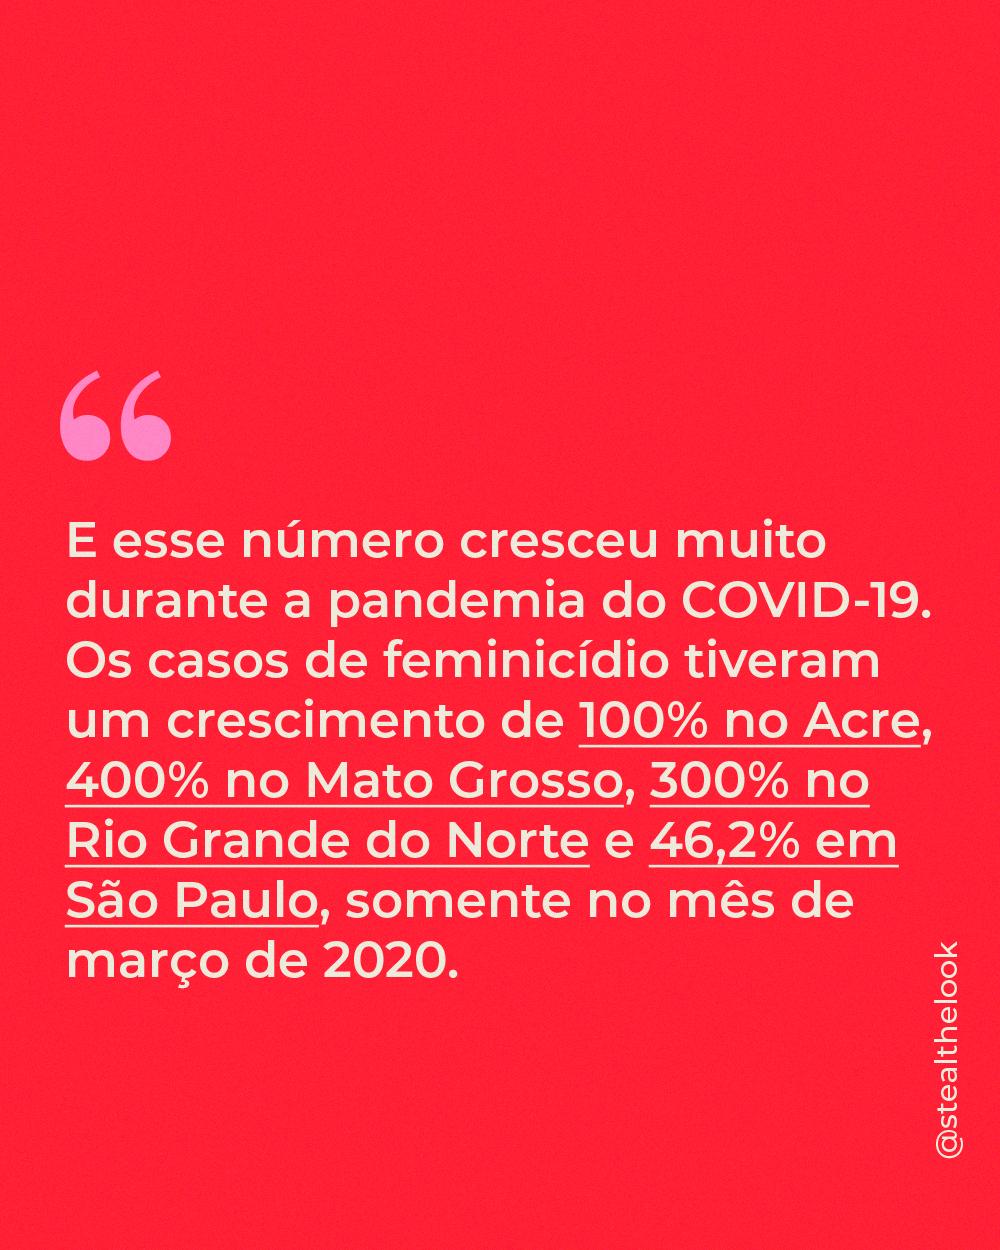 It girls - Feminicídio - Feminismo - Outono - Street Style - https://stealthelook.com.br